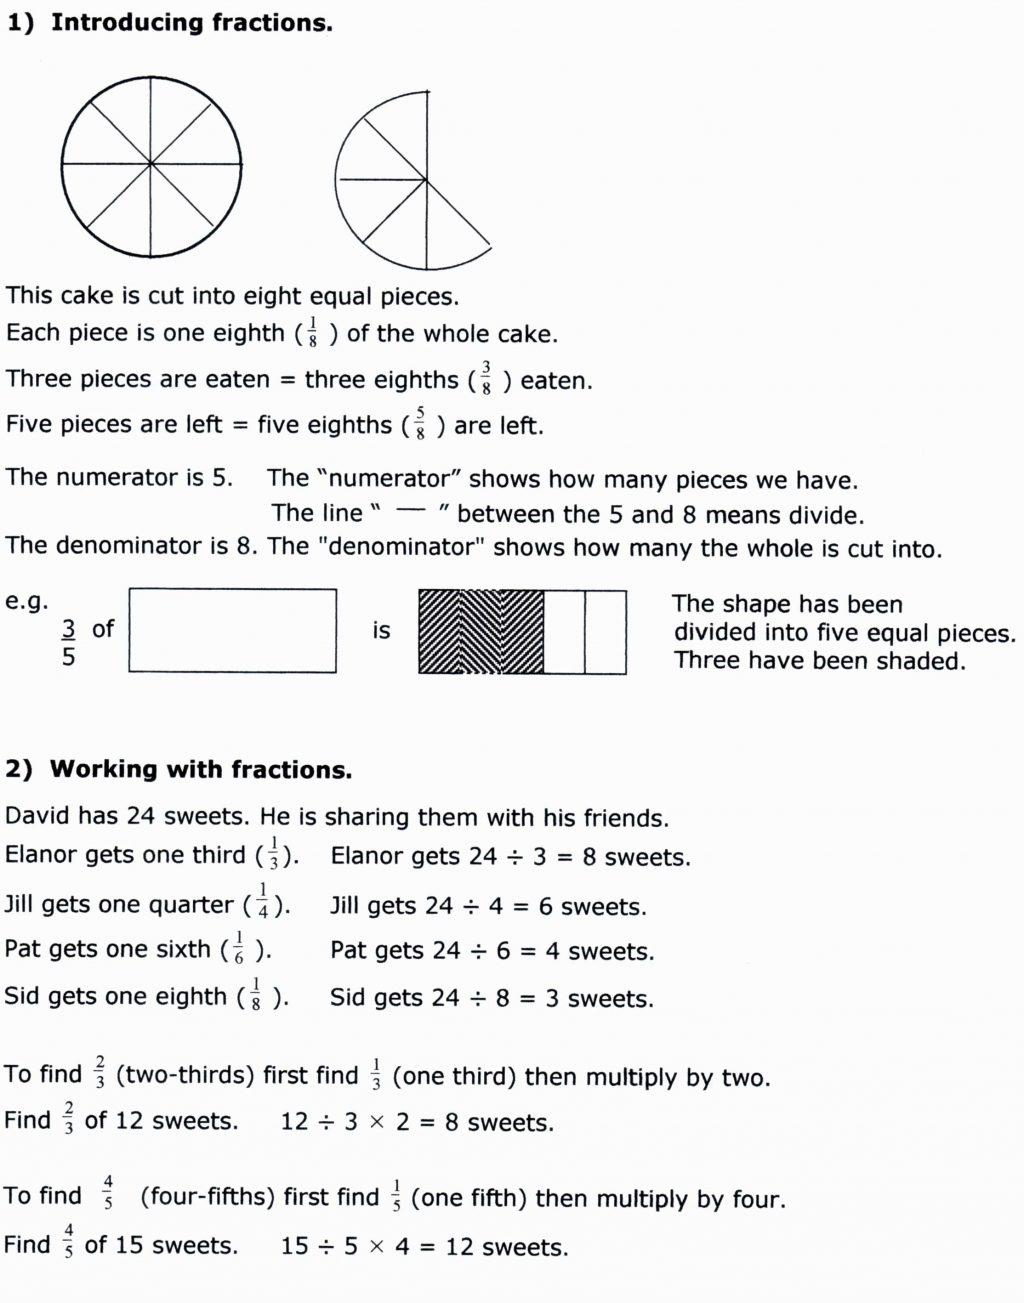 Fractions Worksheets 7th Grade Math Printable Worksheet